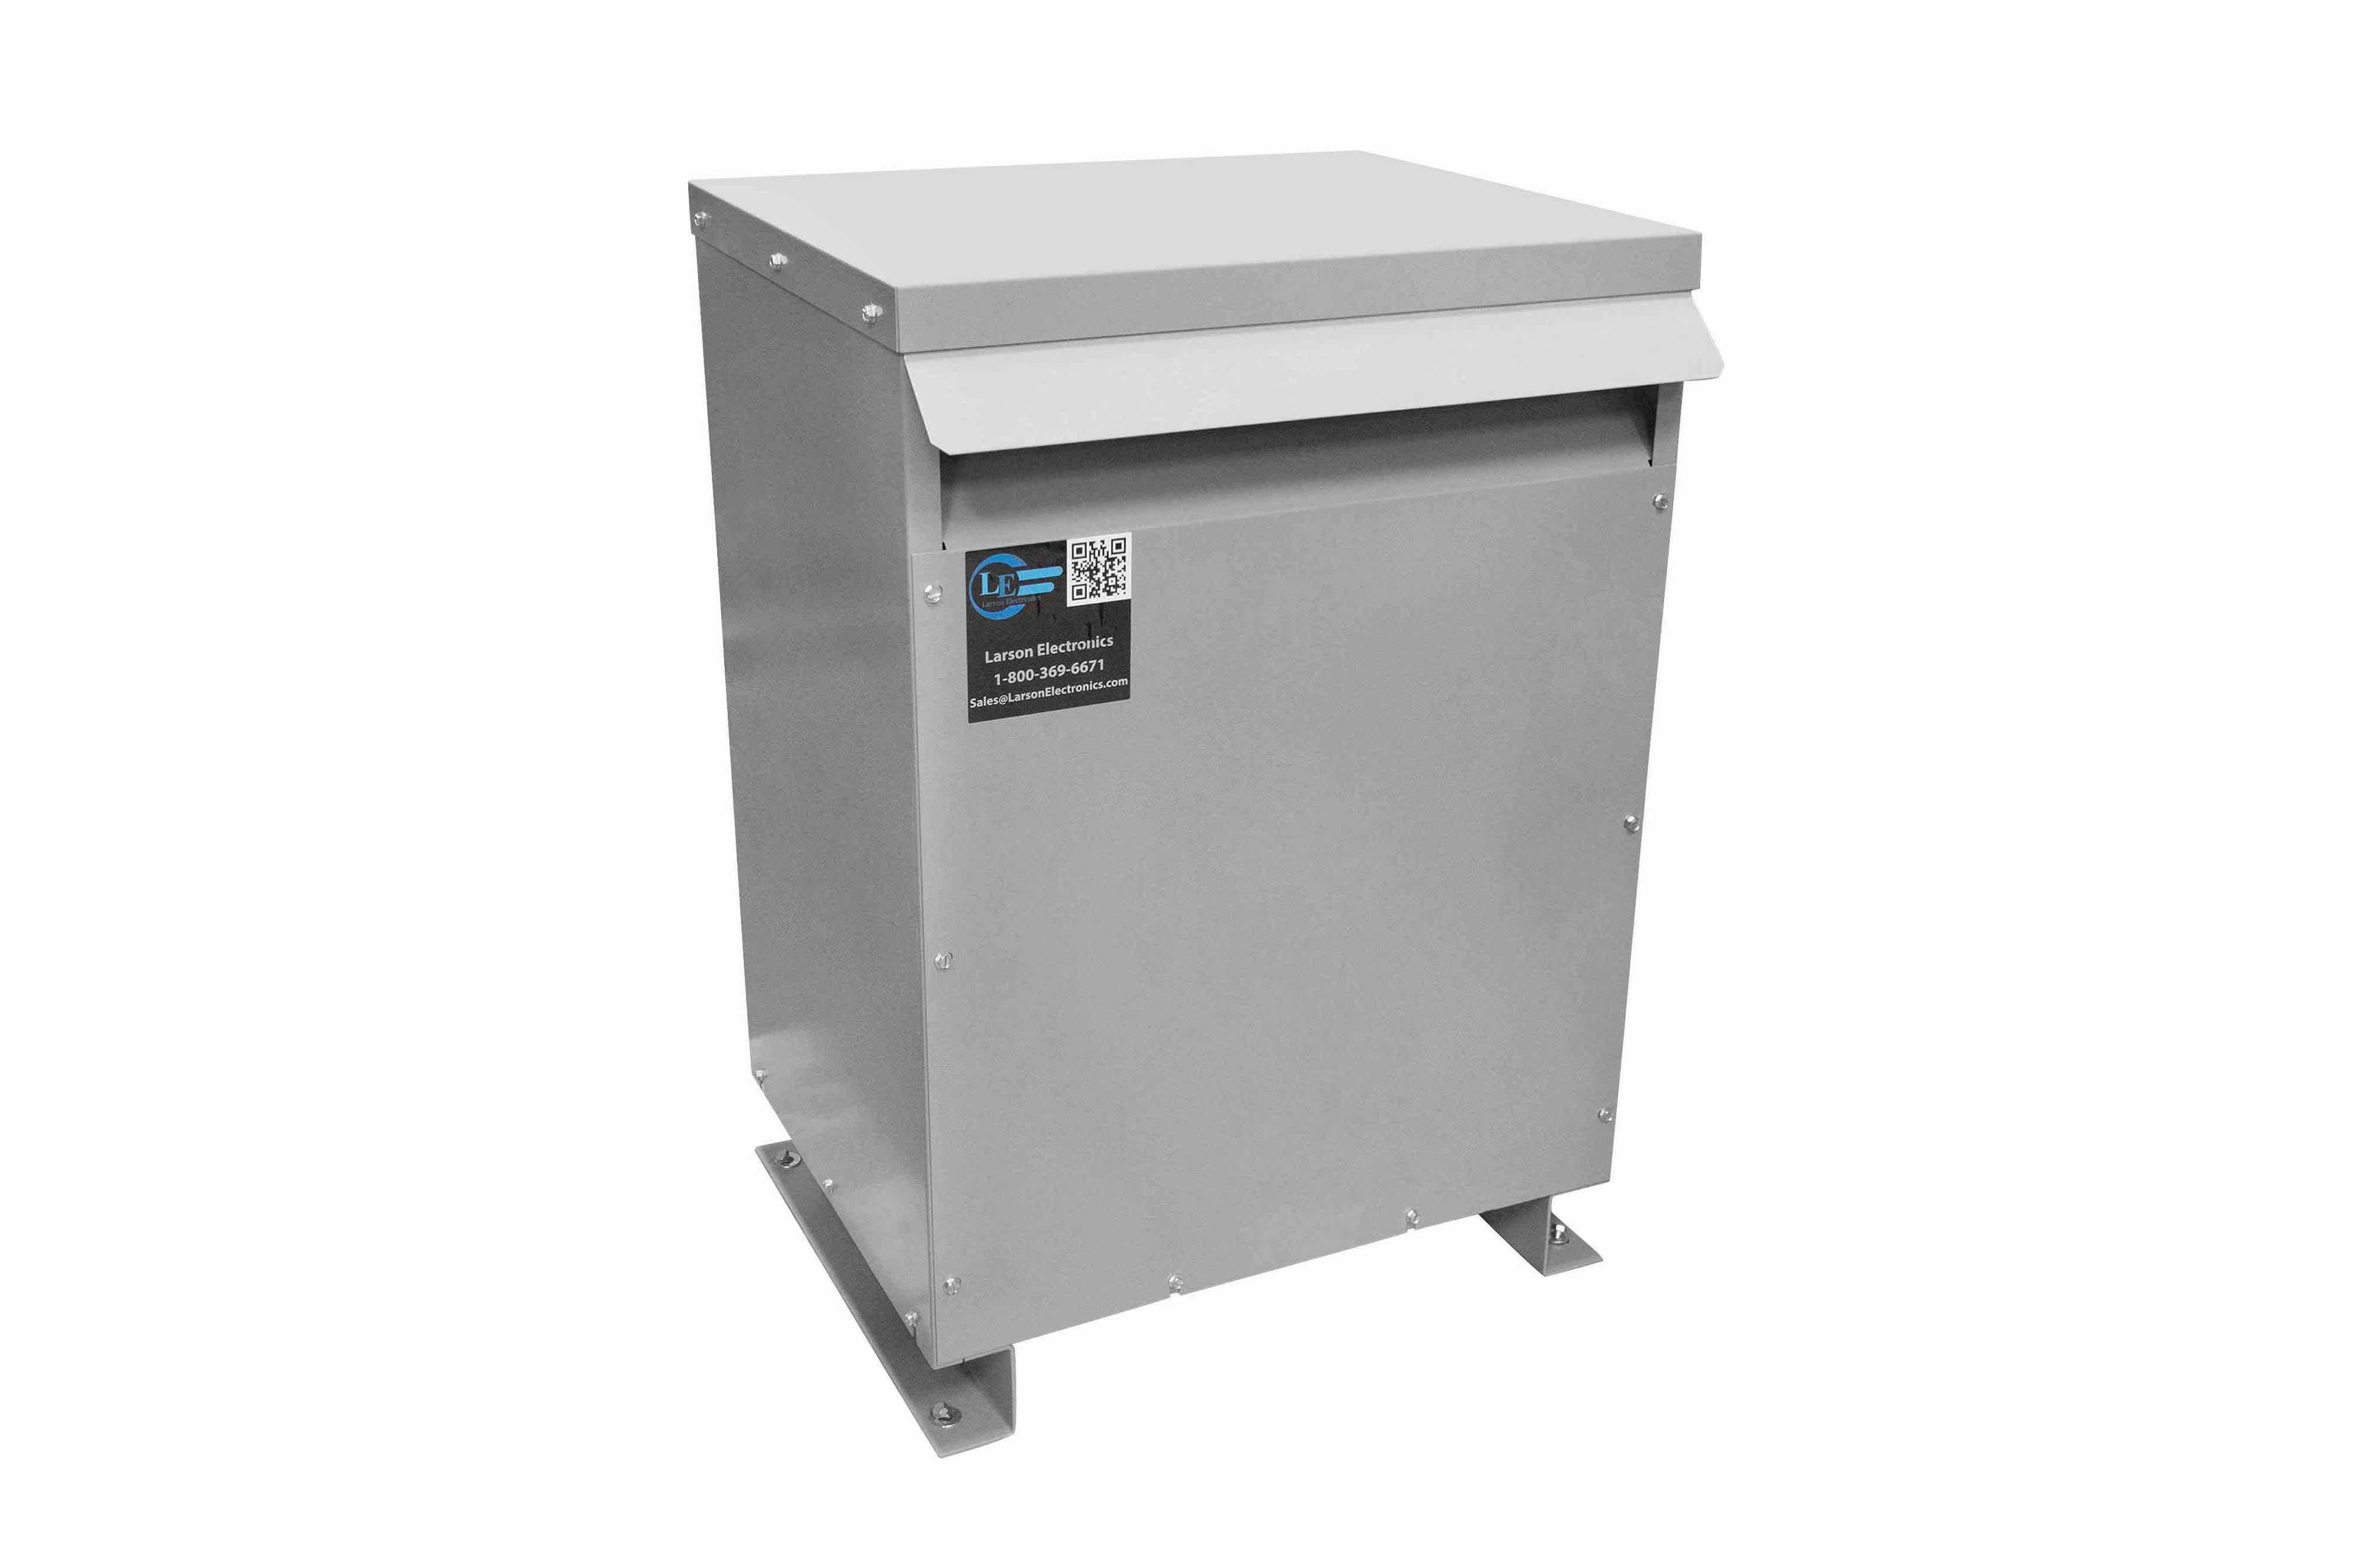 9 kVA 3PH Isolation Transformer, 575V Wye Primary, 240V/120 Delta Secondary, N3R, Ventilated, 60 Hz